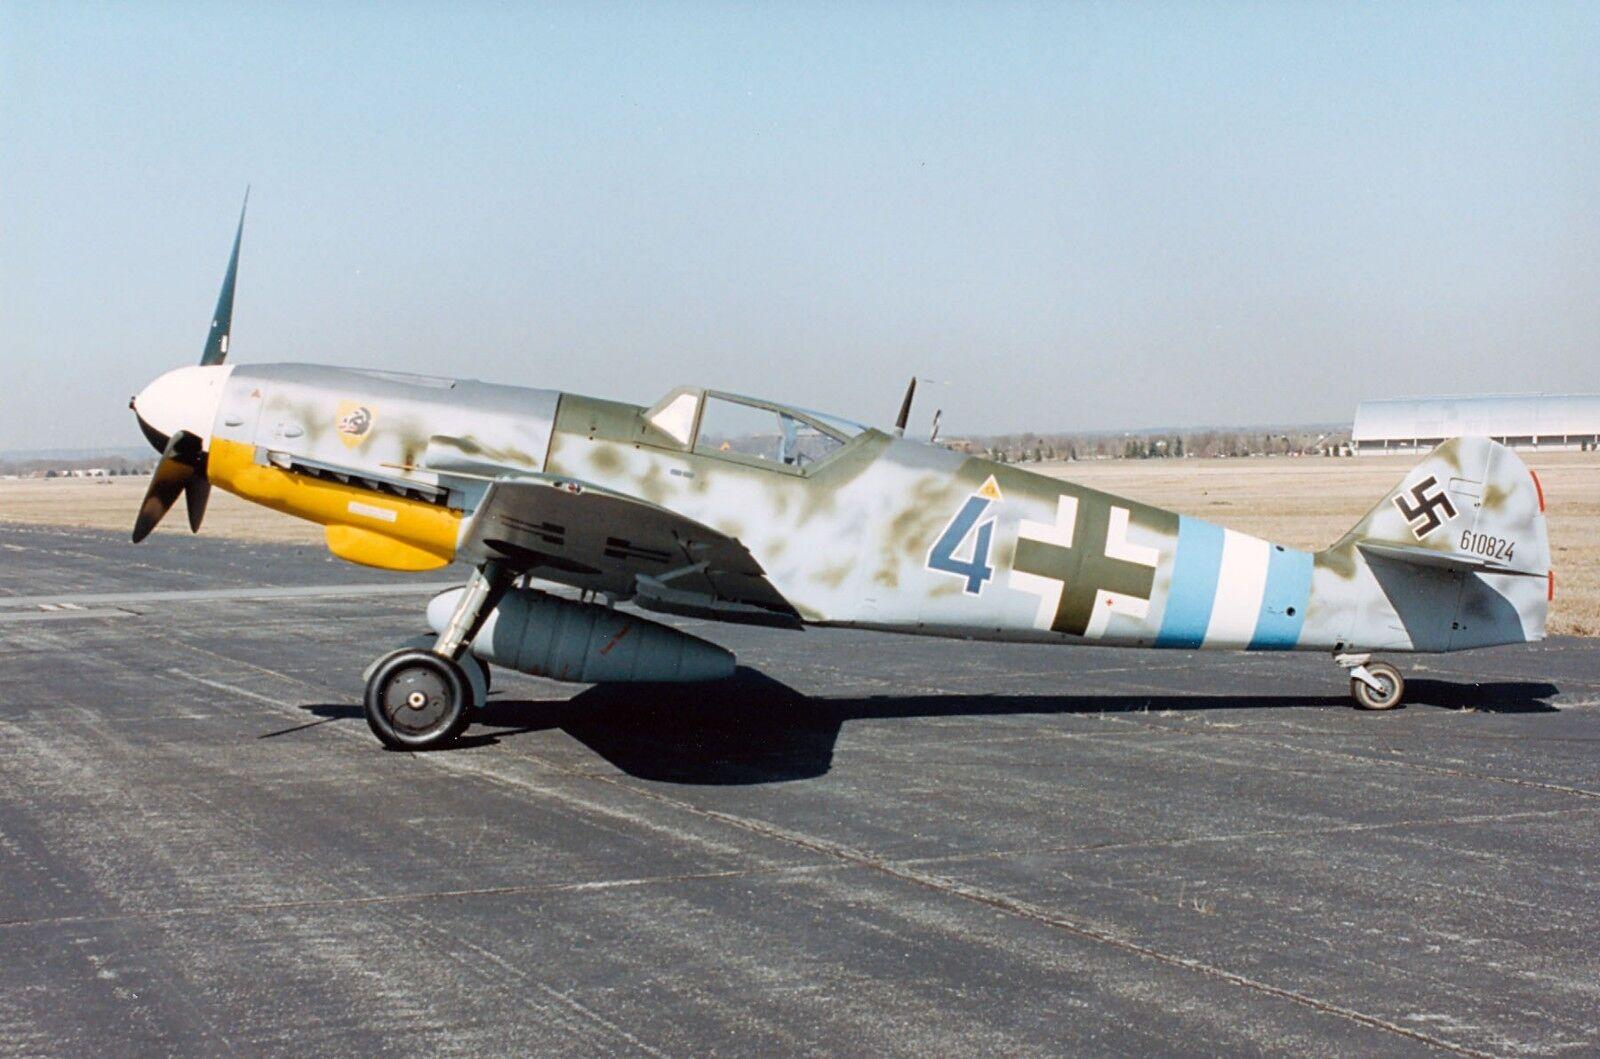 Escala 1 5 BF-109 G-10 K4 Kit de corto de corte láser con planes Impreso, 78.5  ala palmo